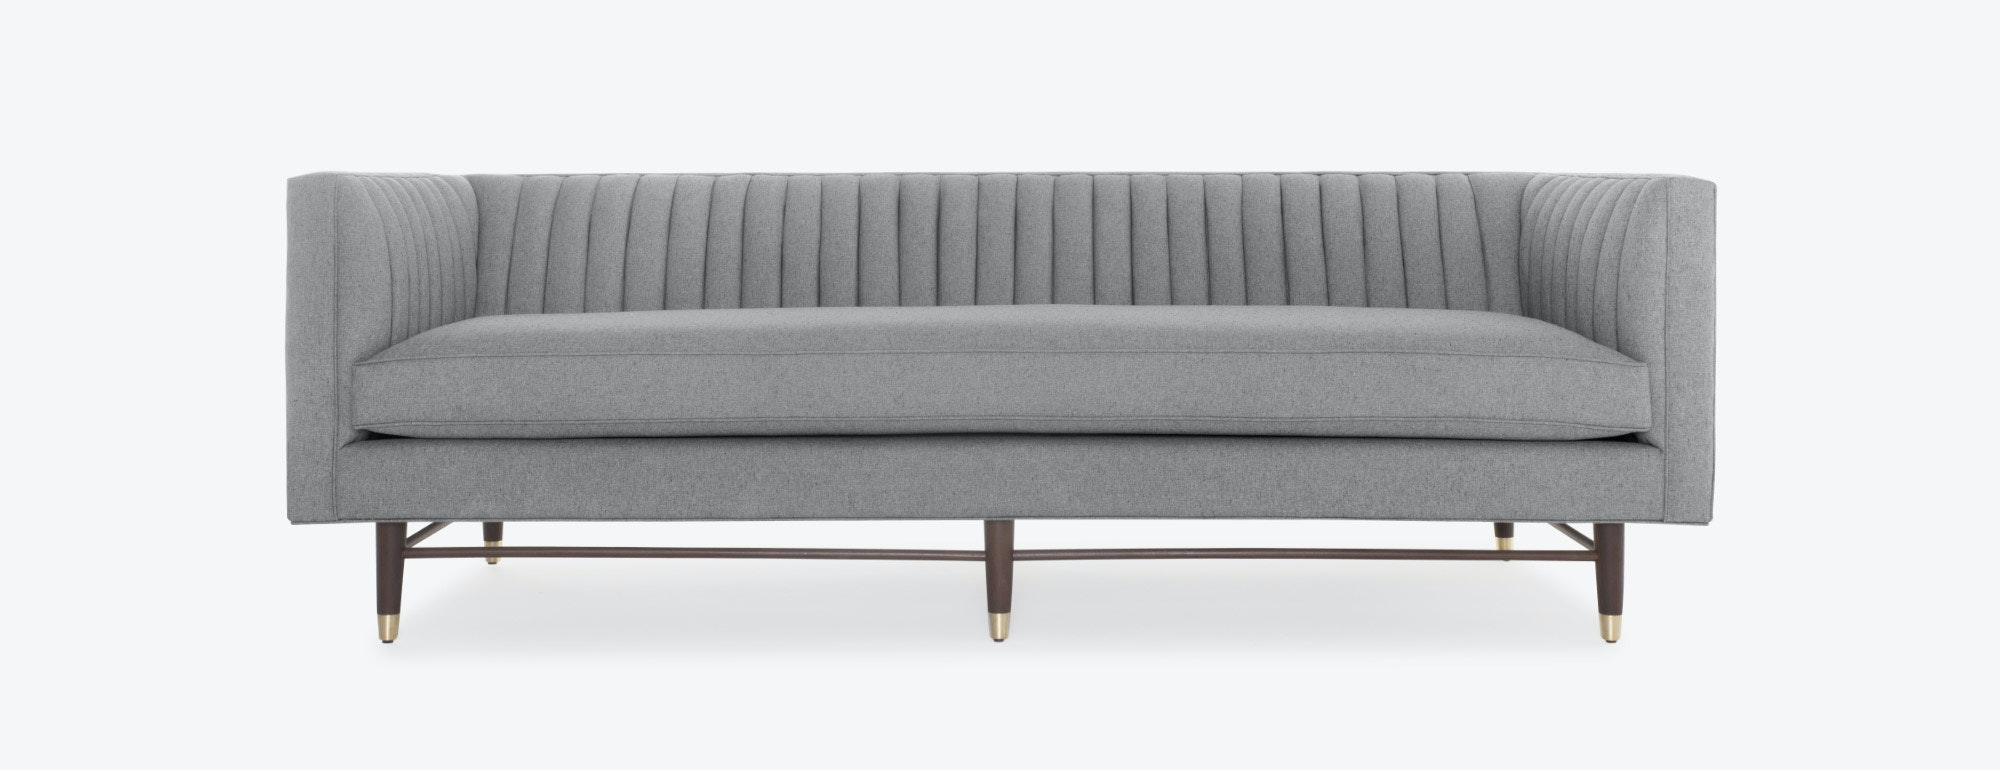 chelsea square sofa cane back craigslist sofas modern living room furniture